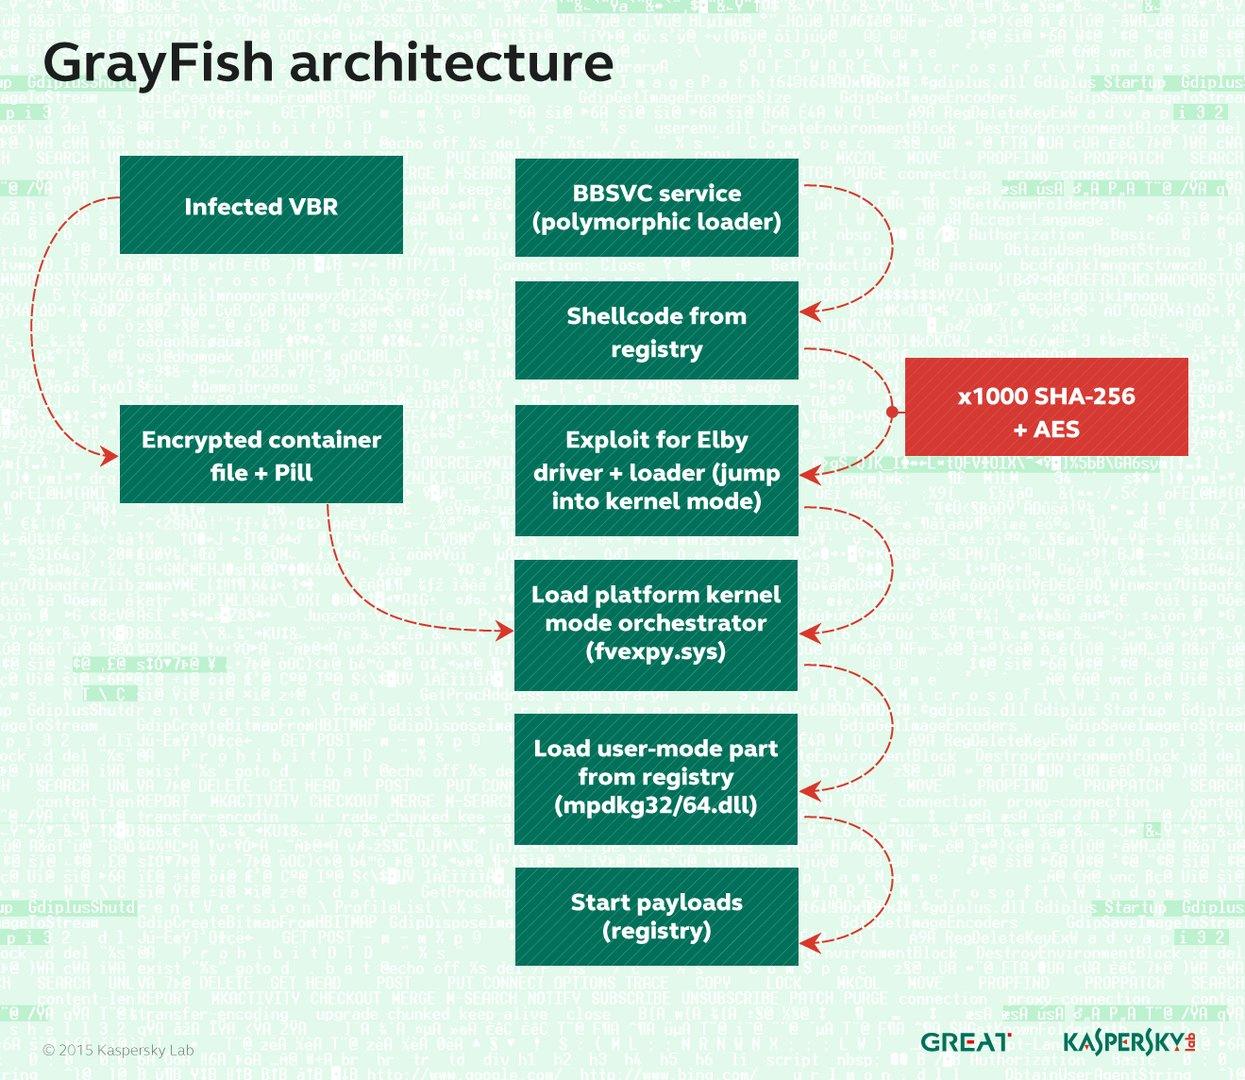 GrayFish ARchitektur